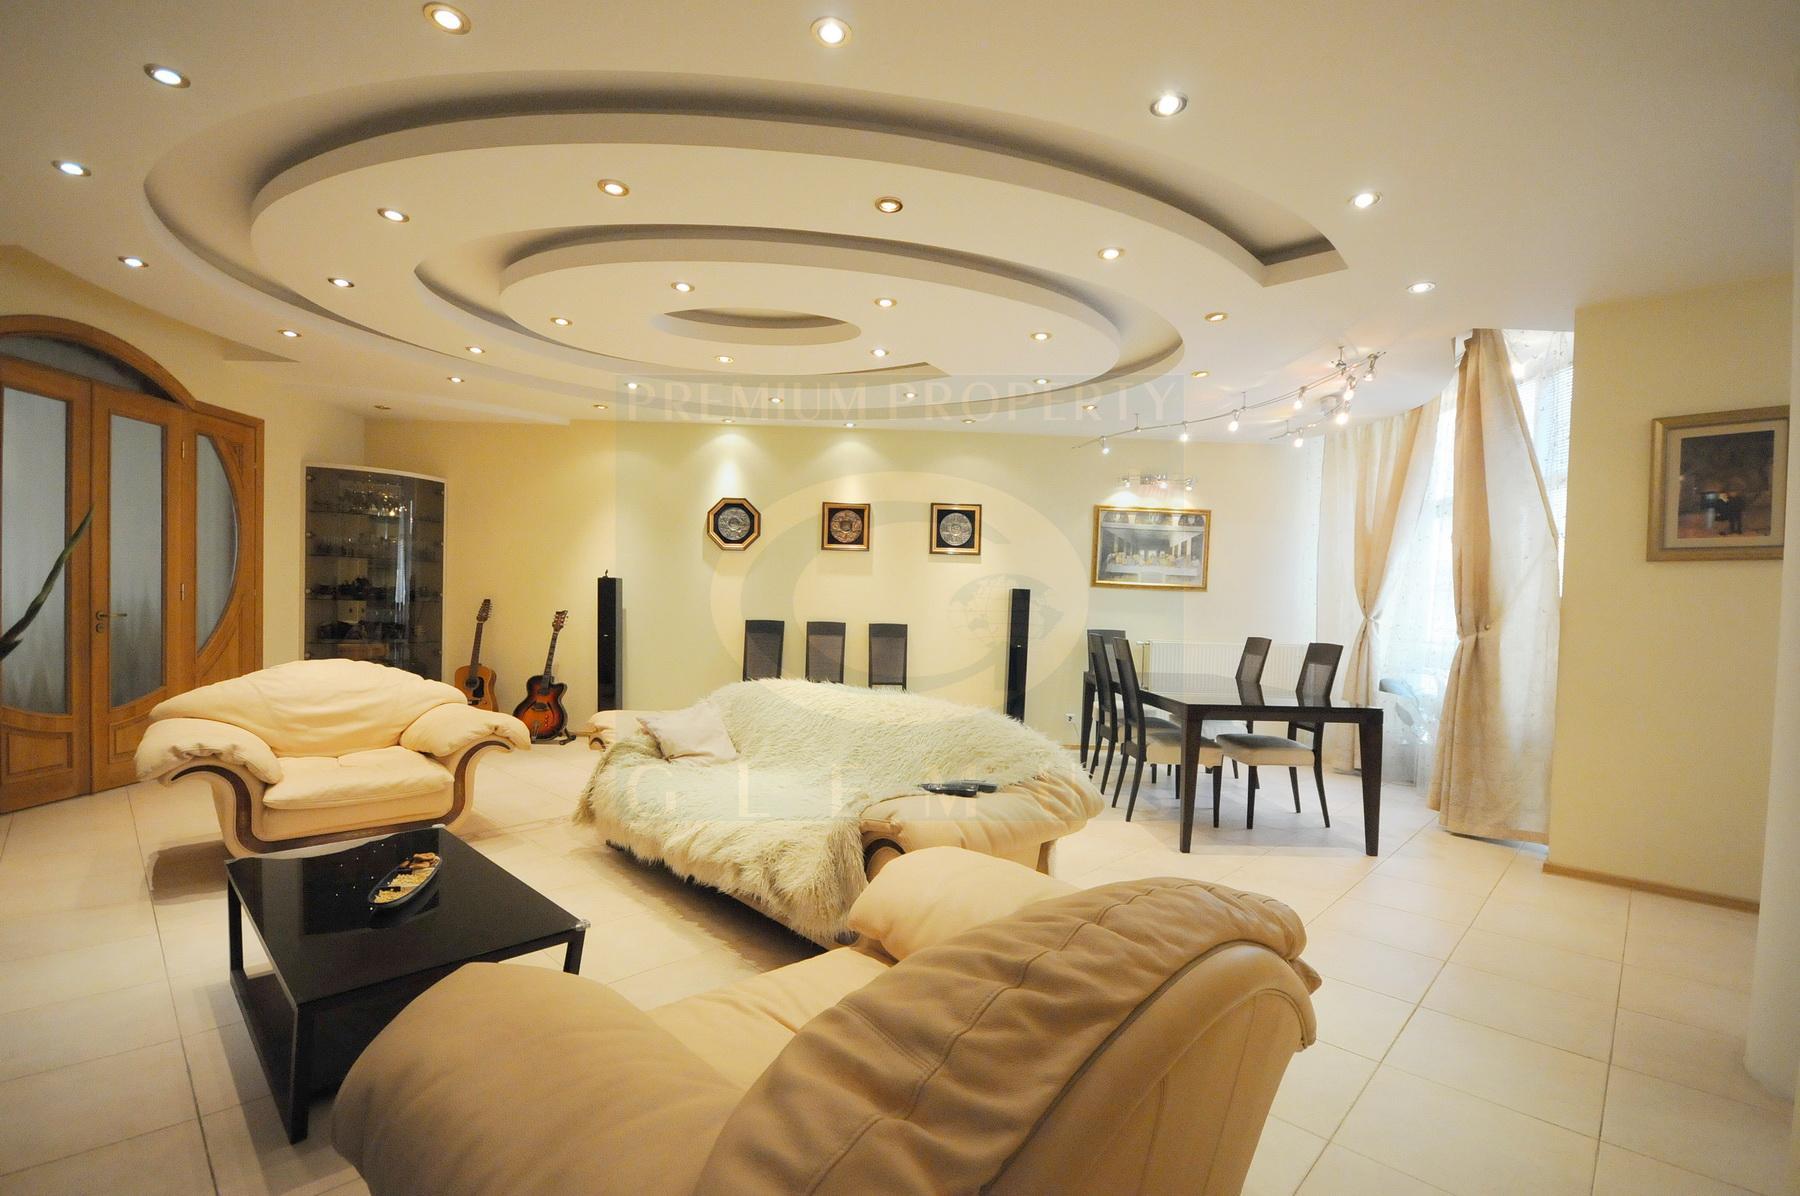 Rent Long Term Apartment In Chisinau